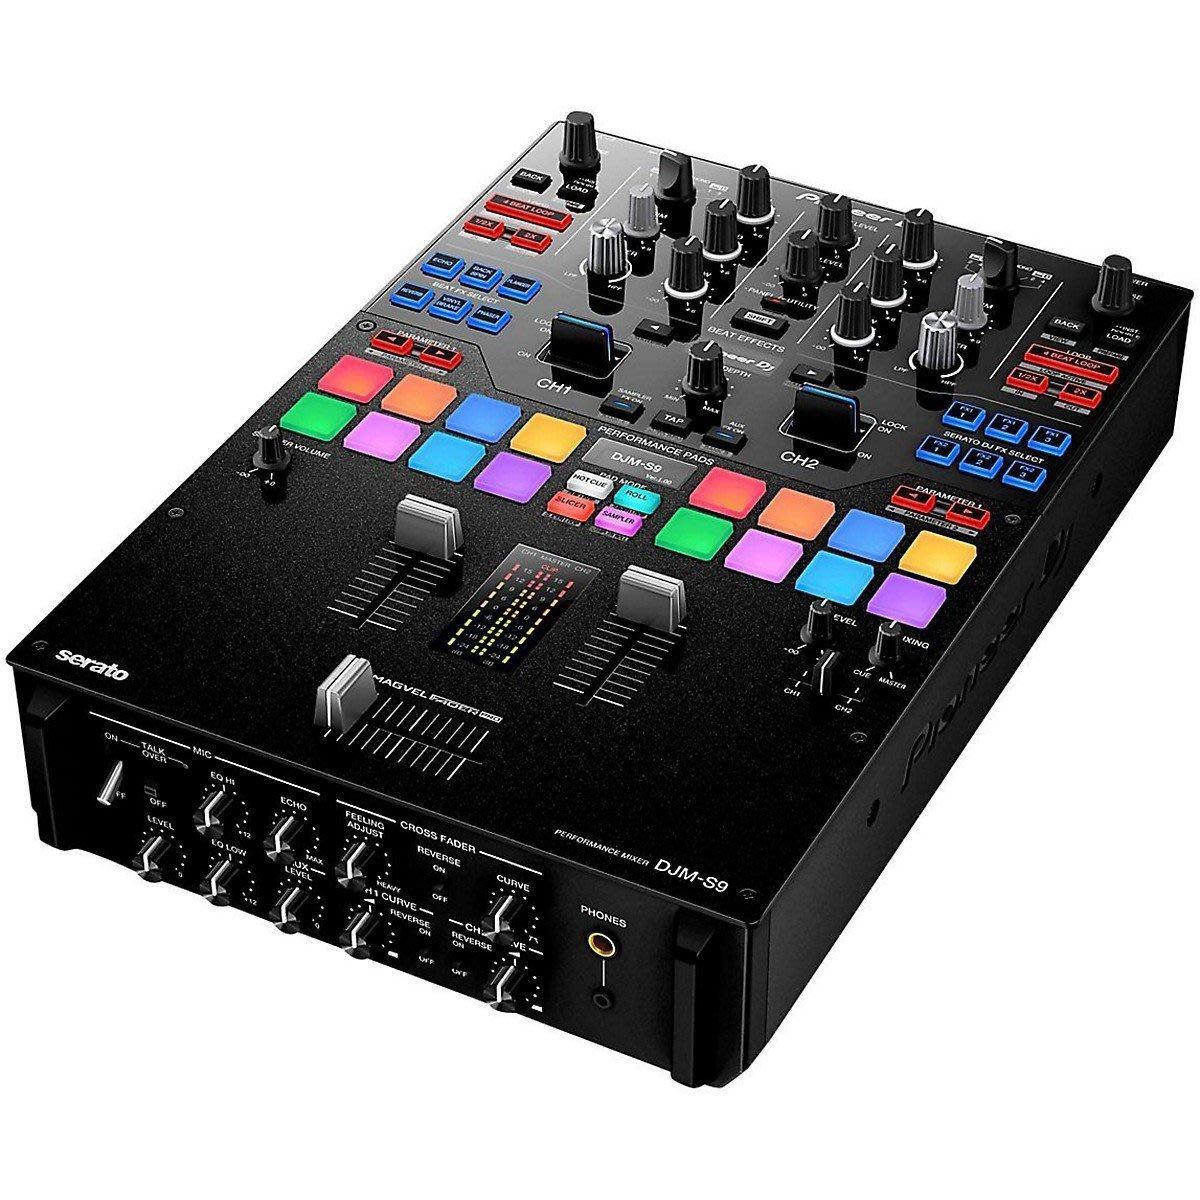 《PLAYER》Pioneer DJM-S9 DJ混音器